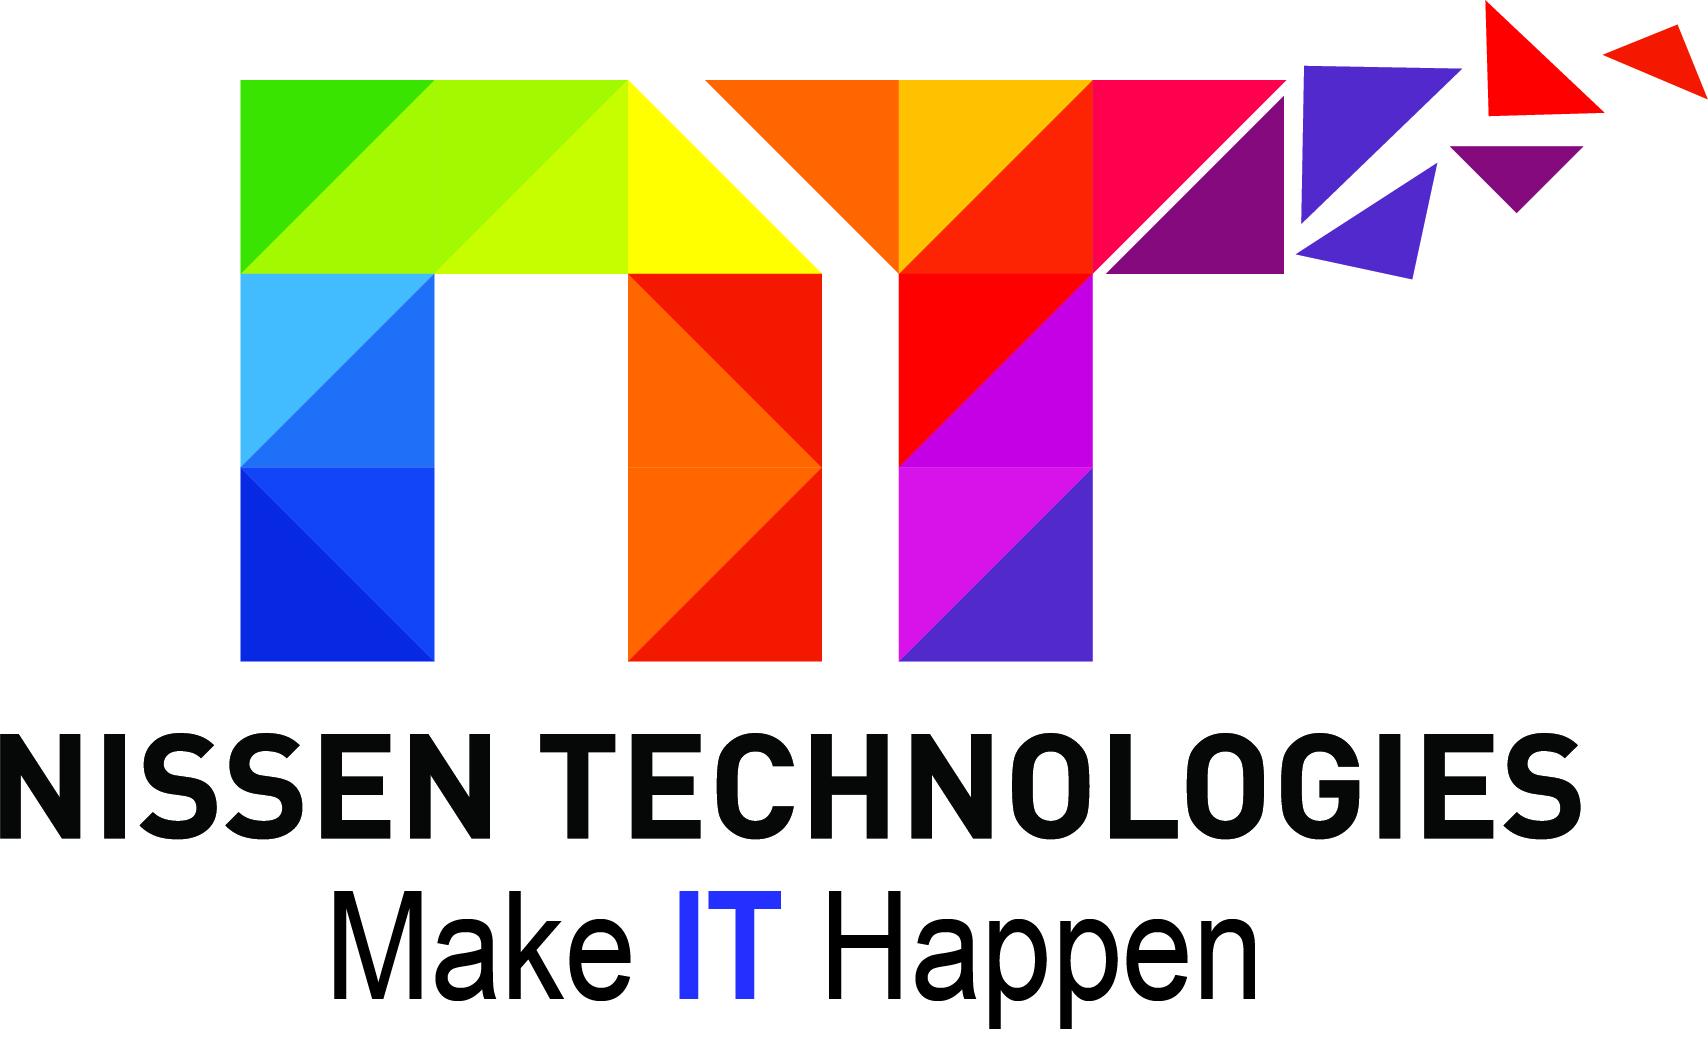 Nissen Technologies